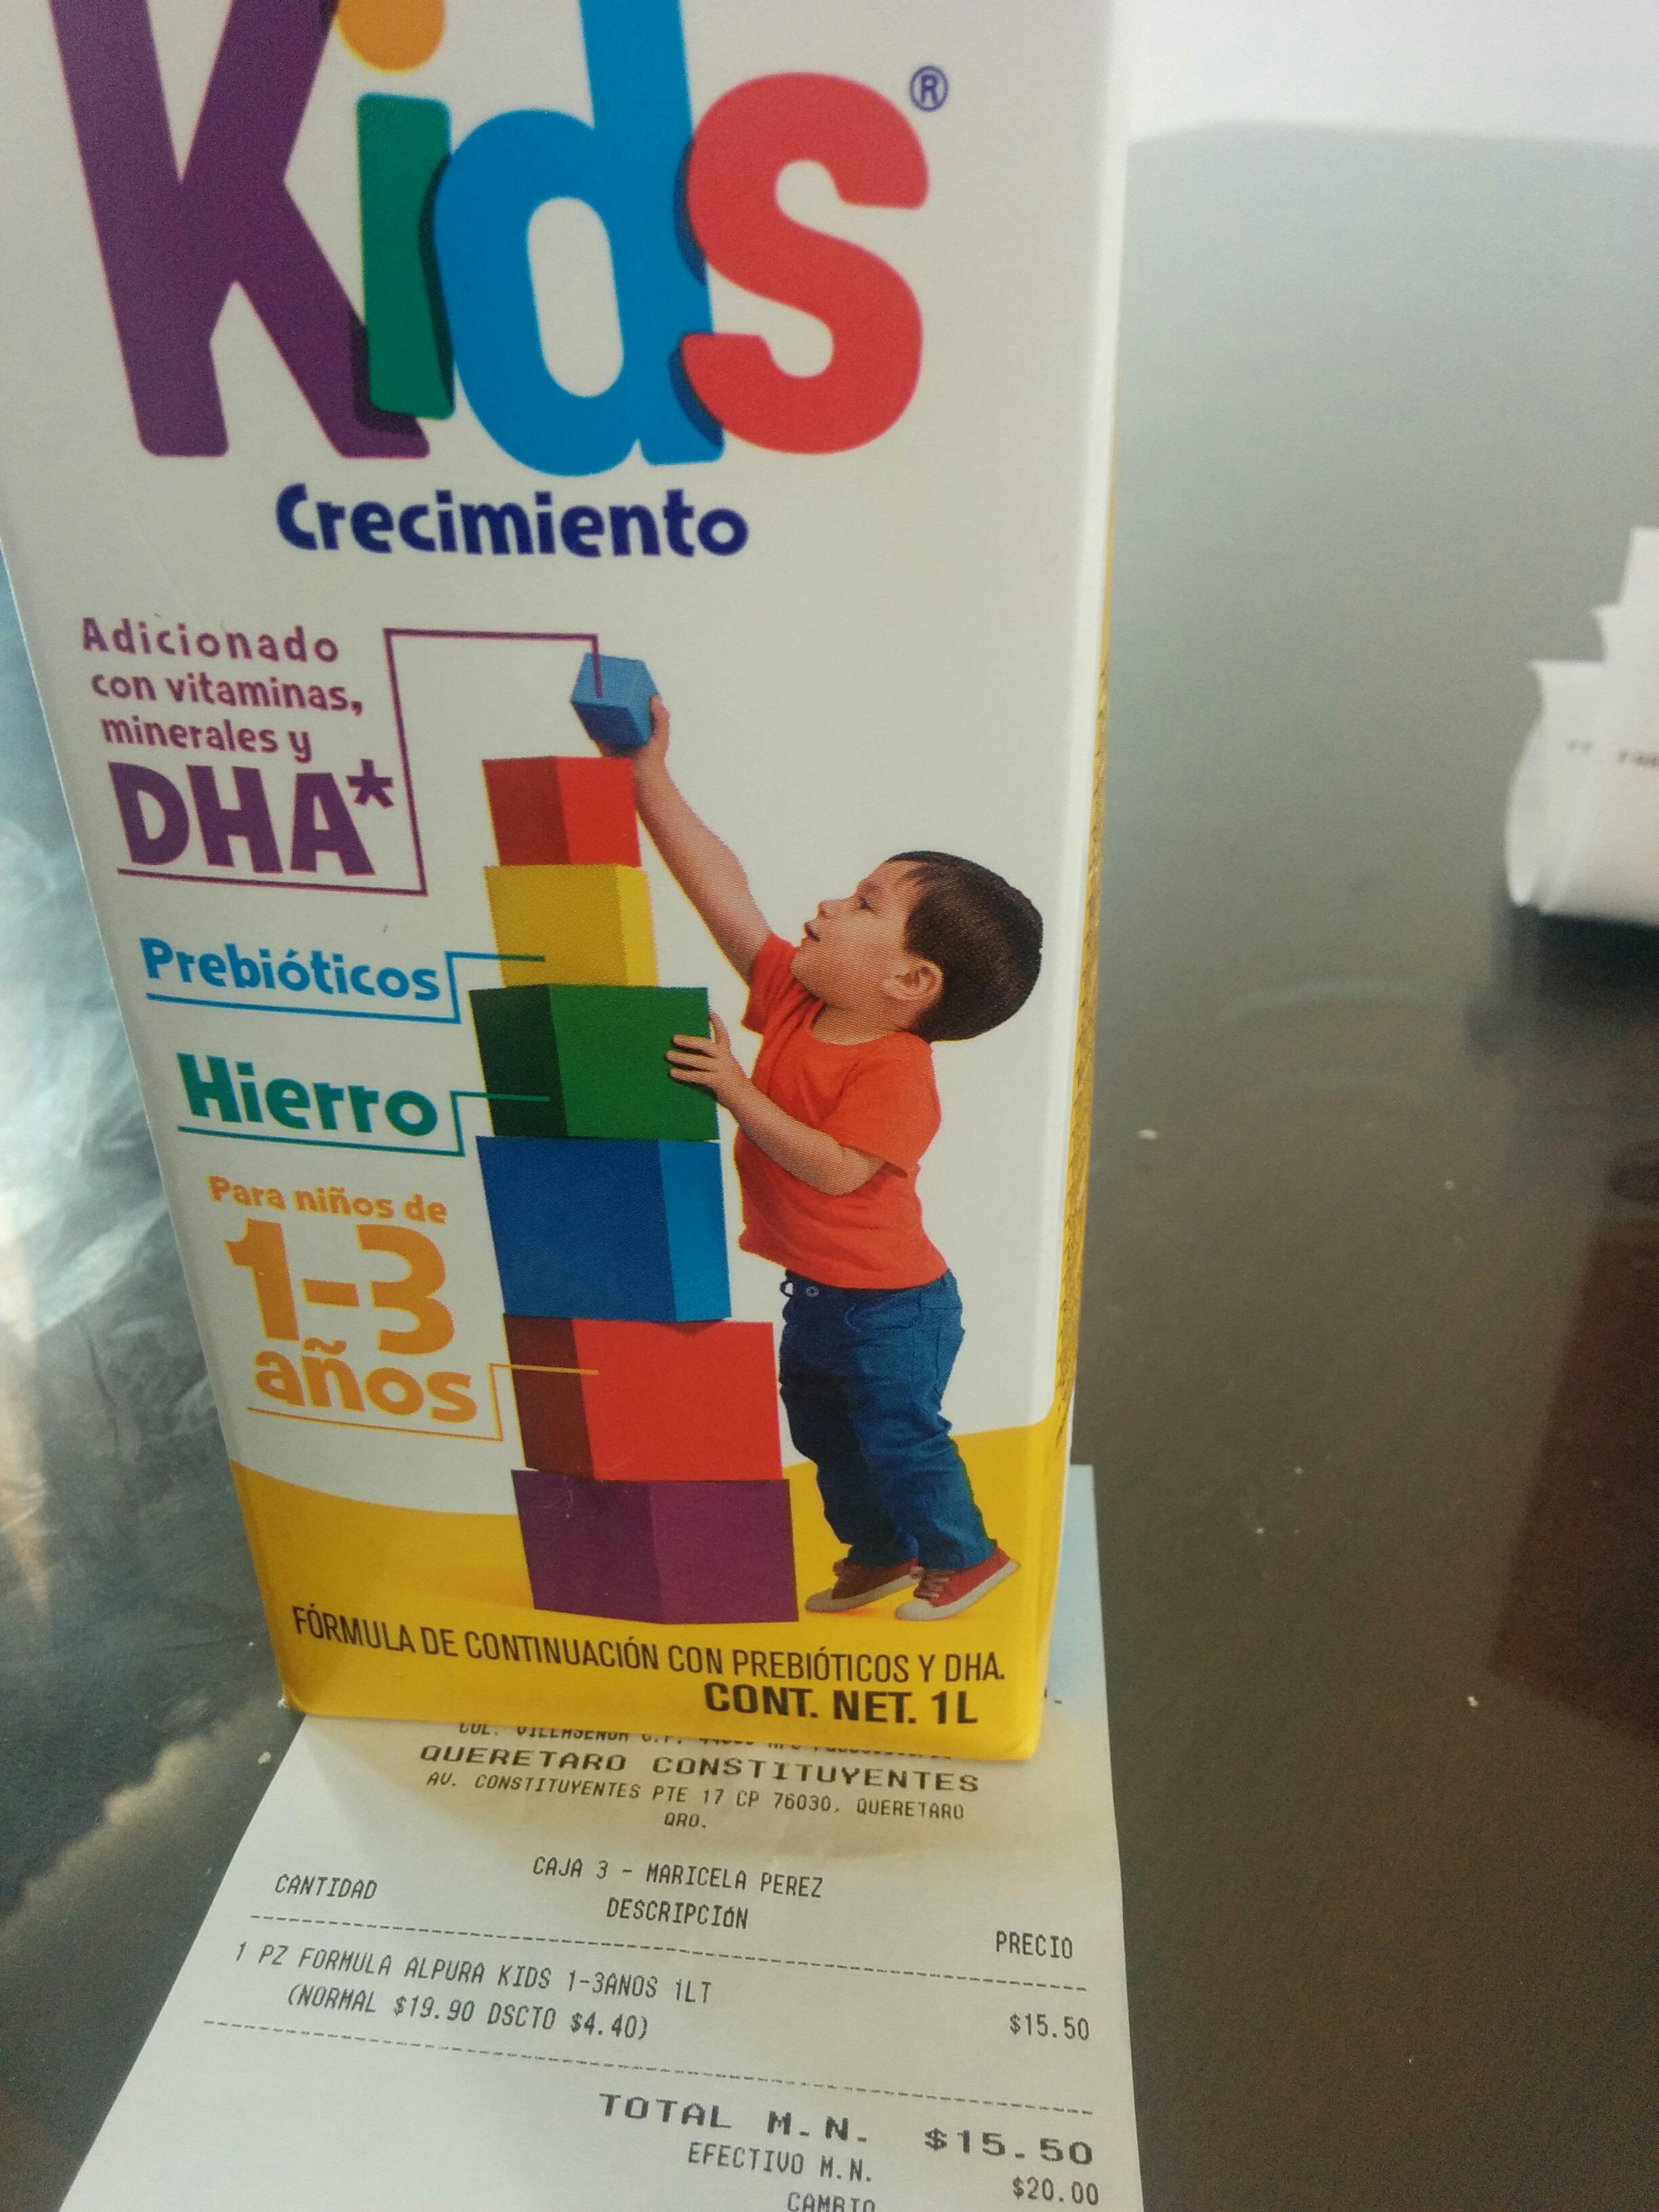 Farmacias Guadalajara: leche Alpura Kids a $15.50